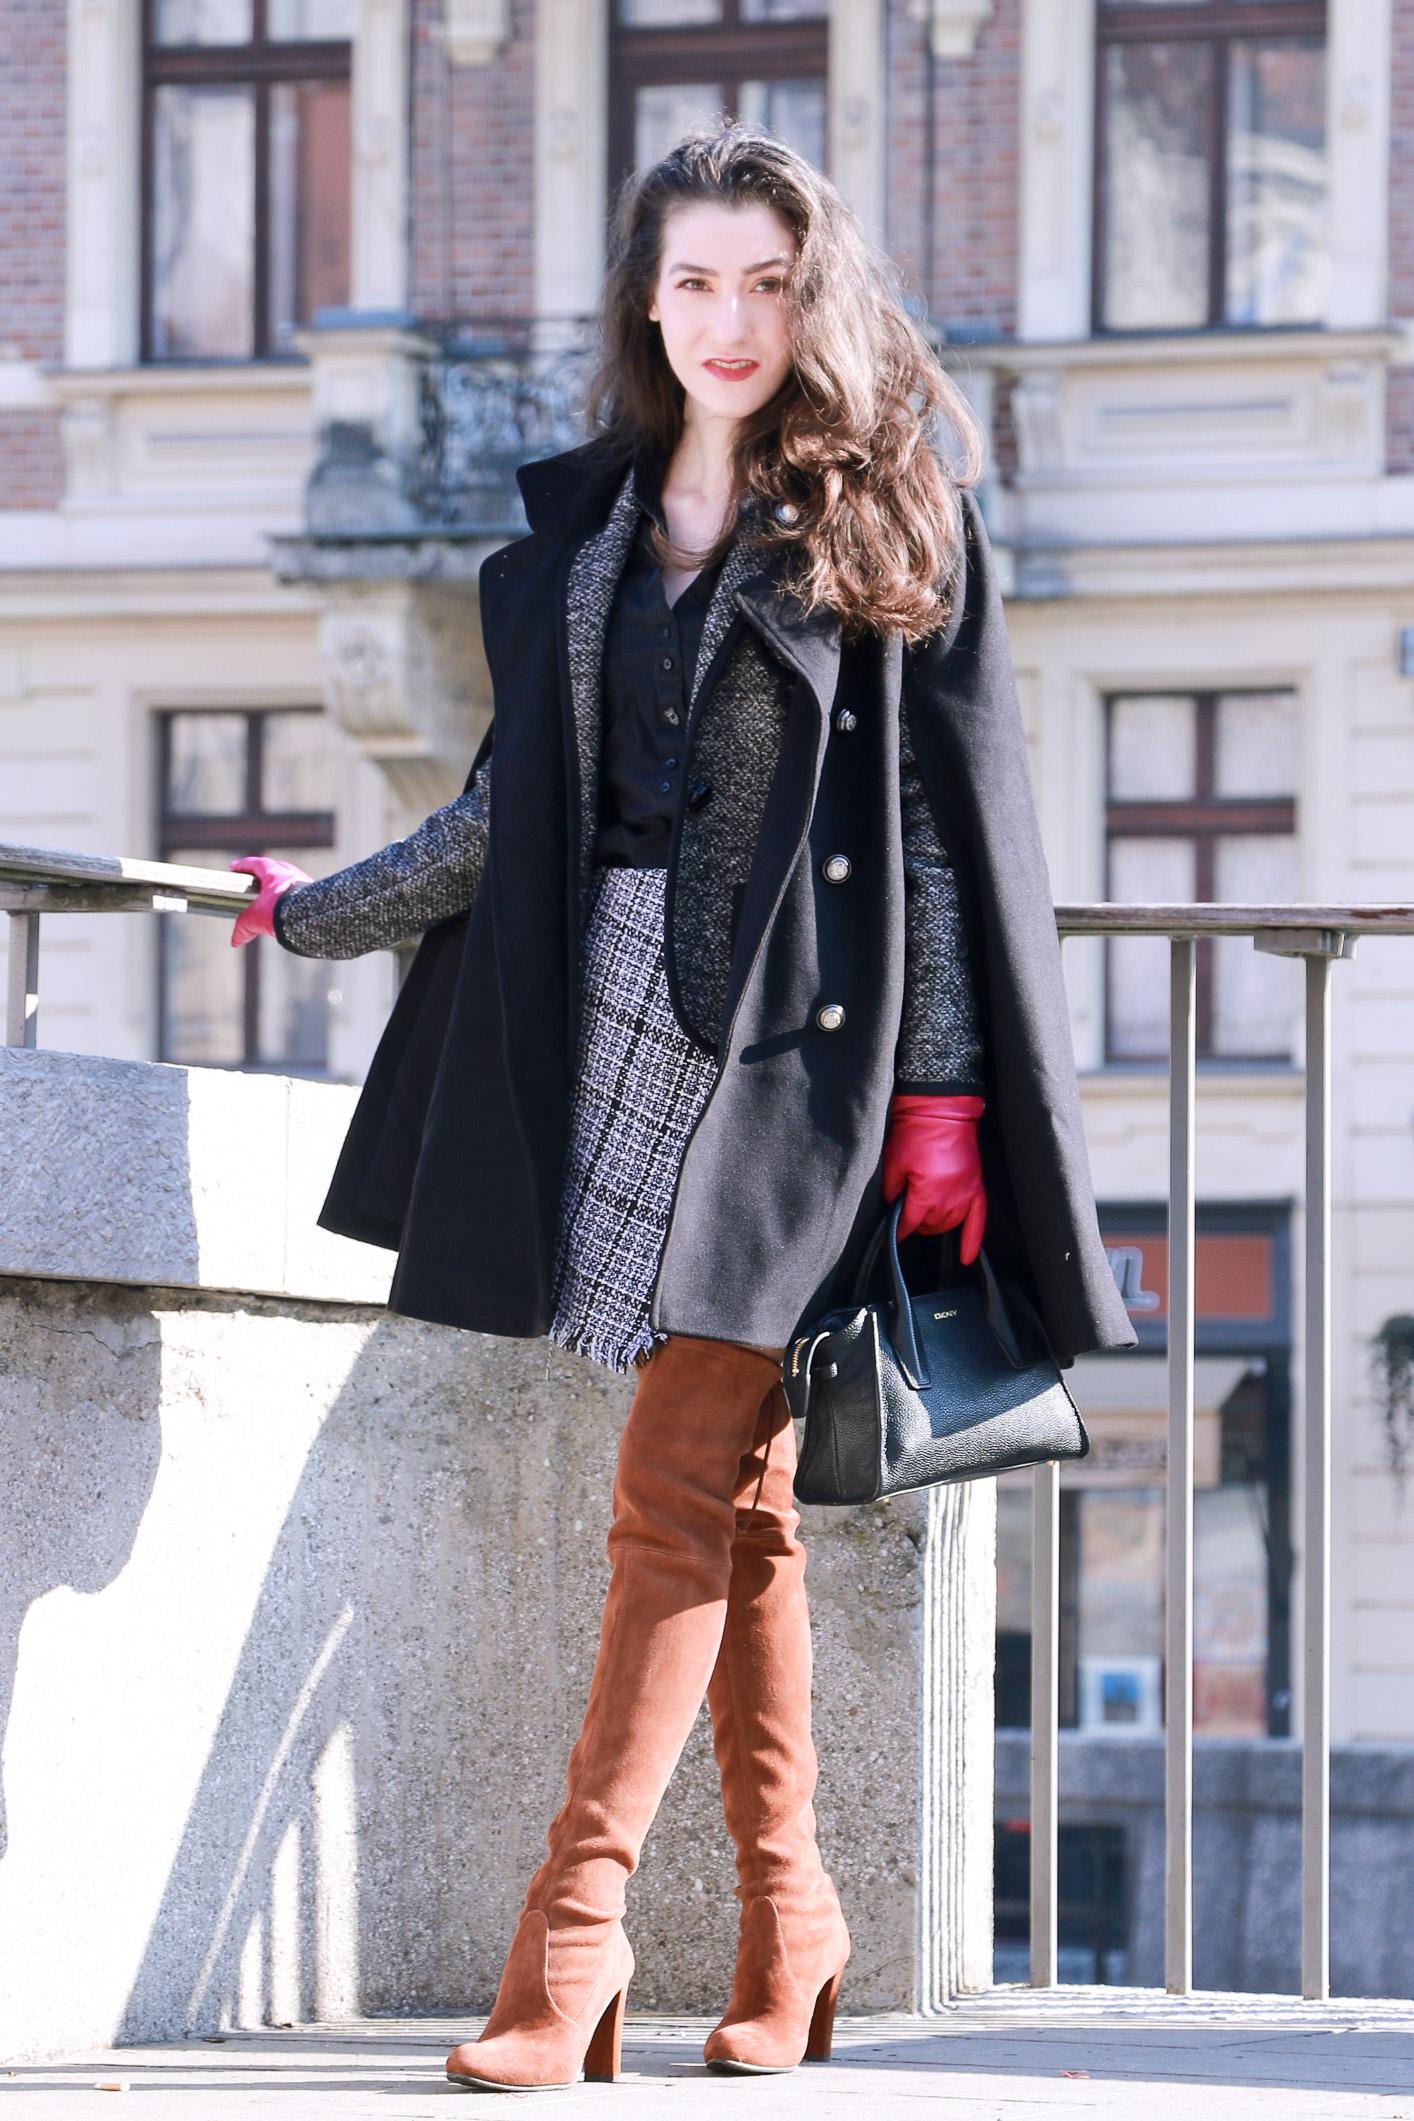 women business casual dress code photo - 1